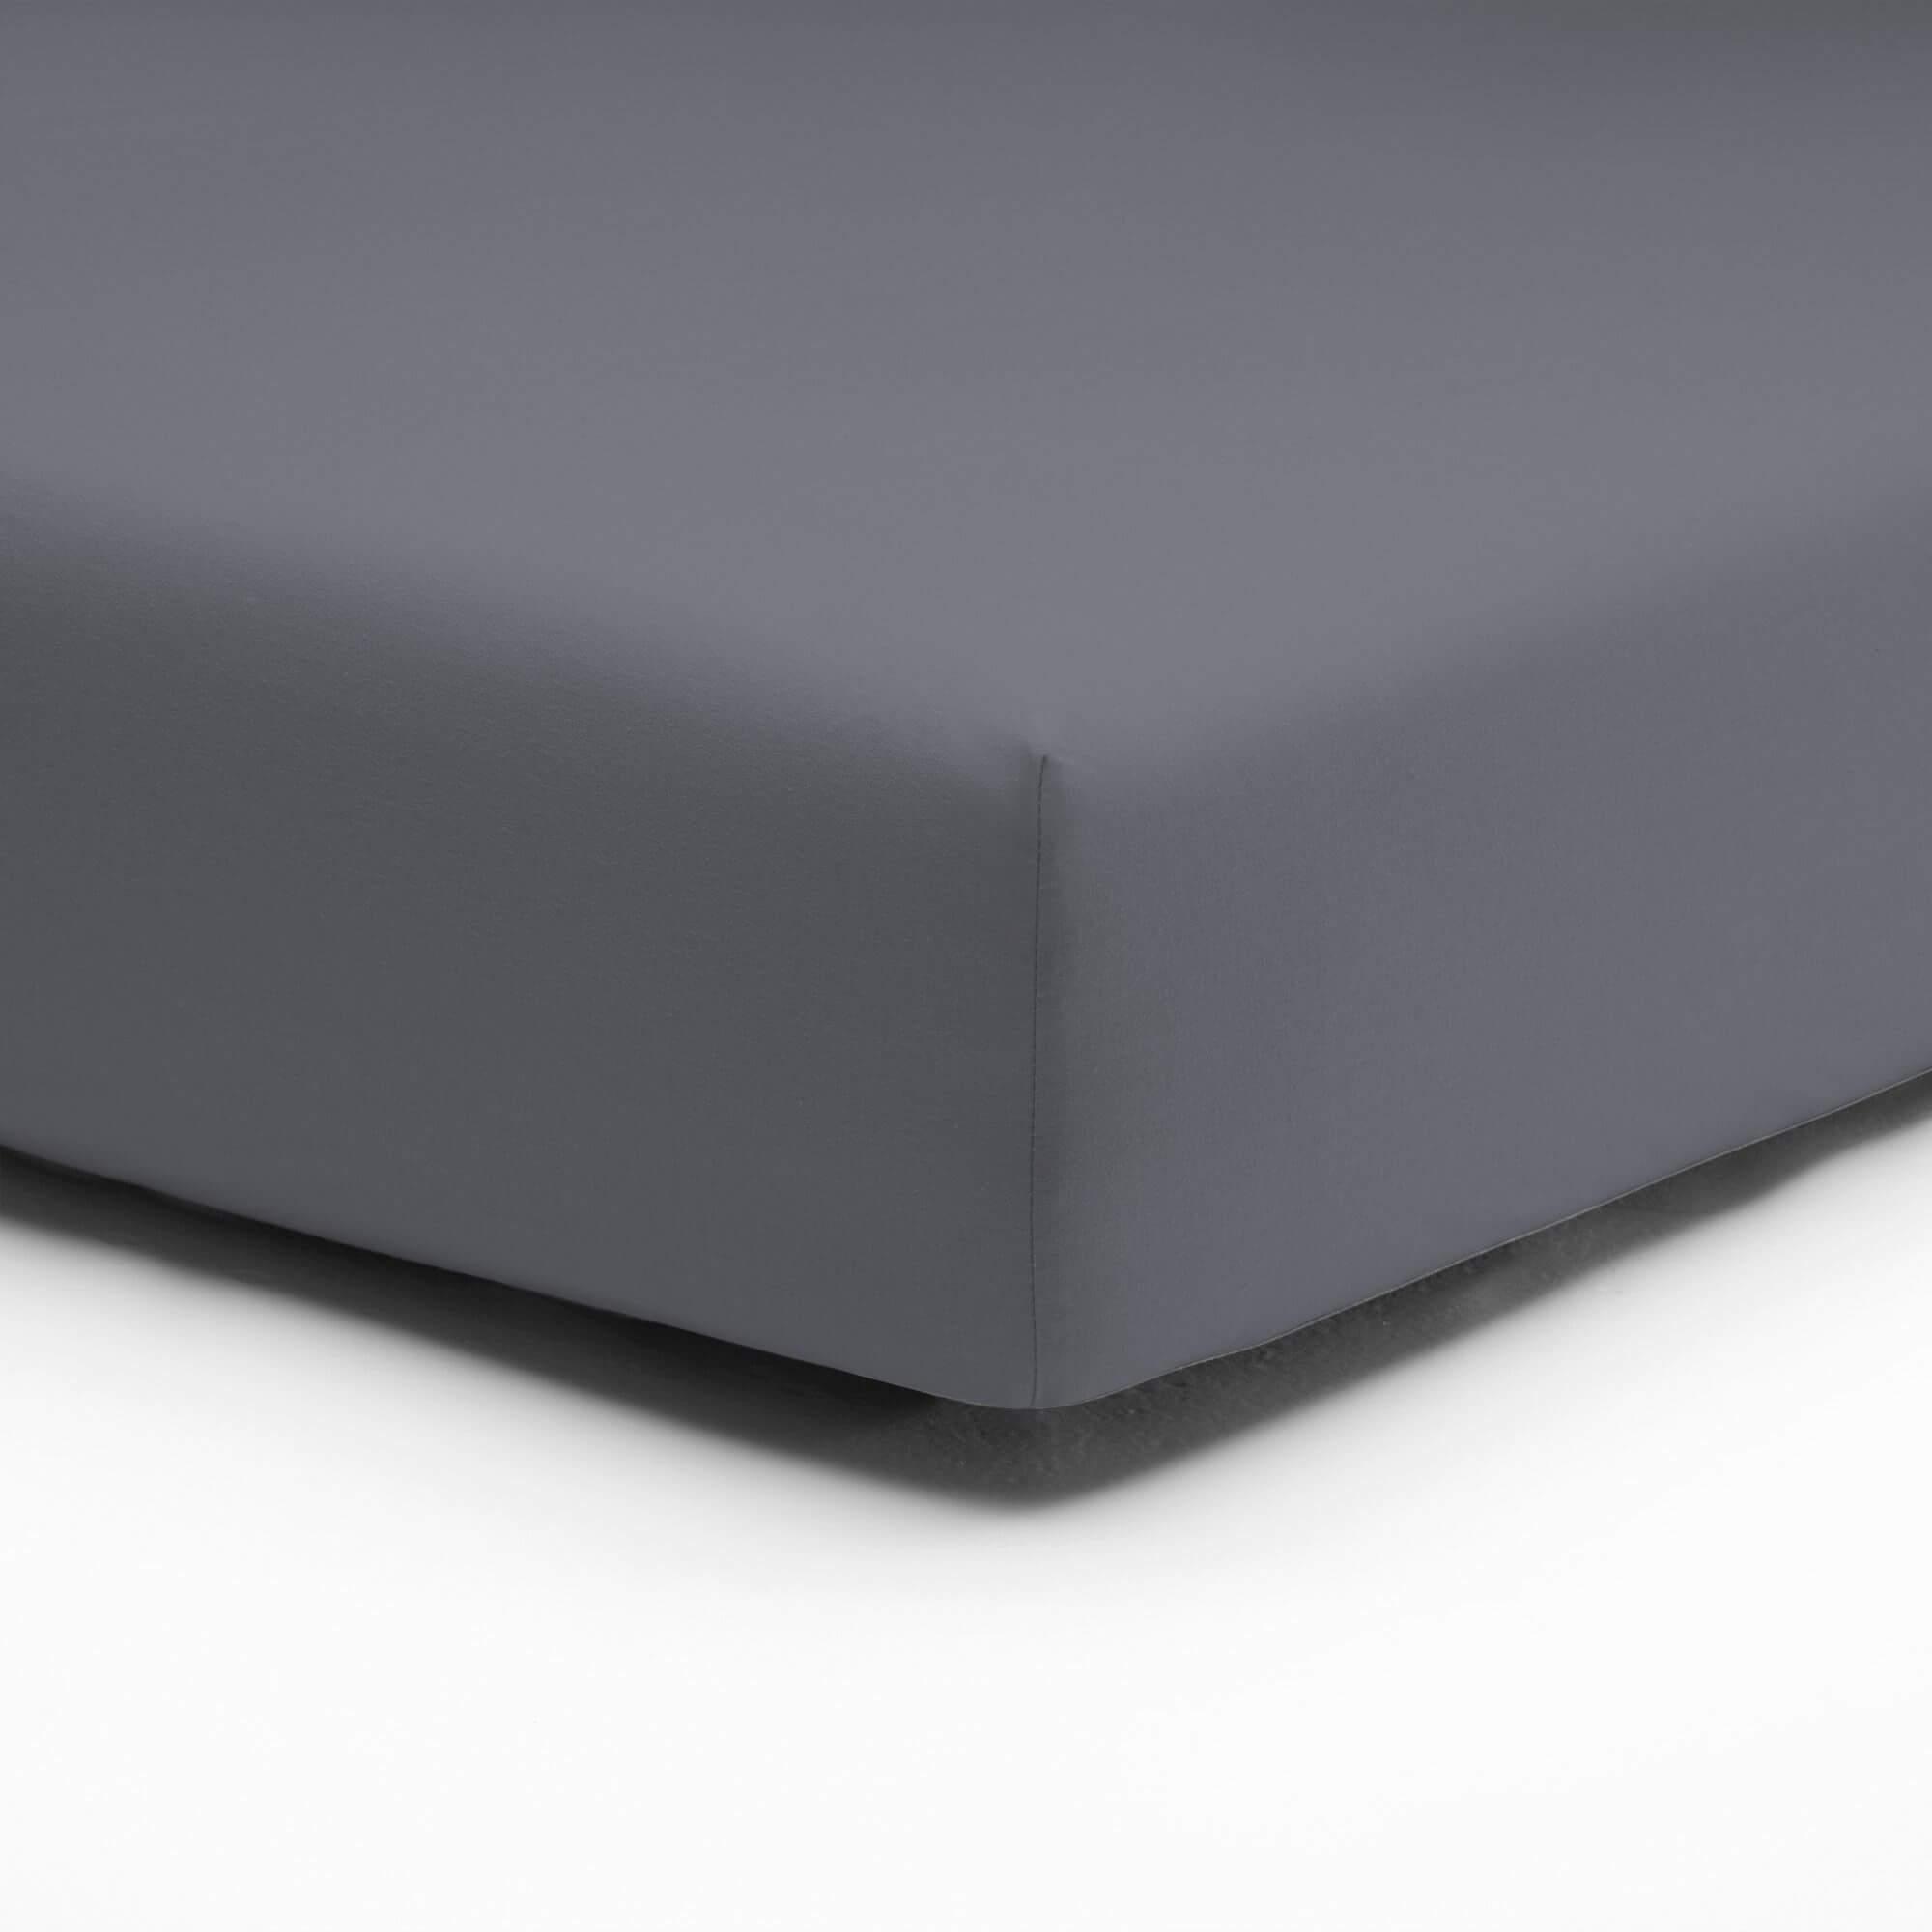 Linon Haustuch / Bettlaken